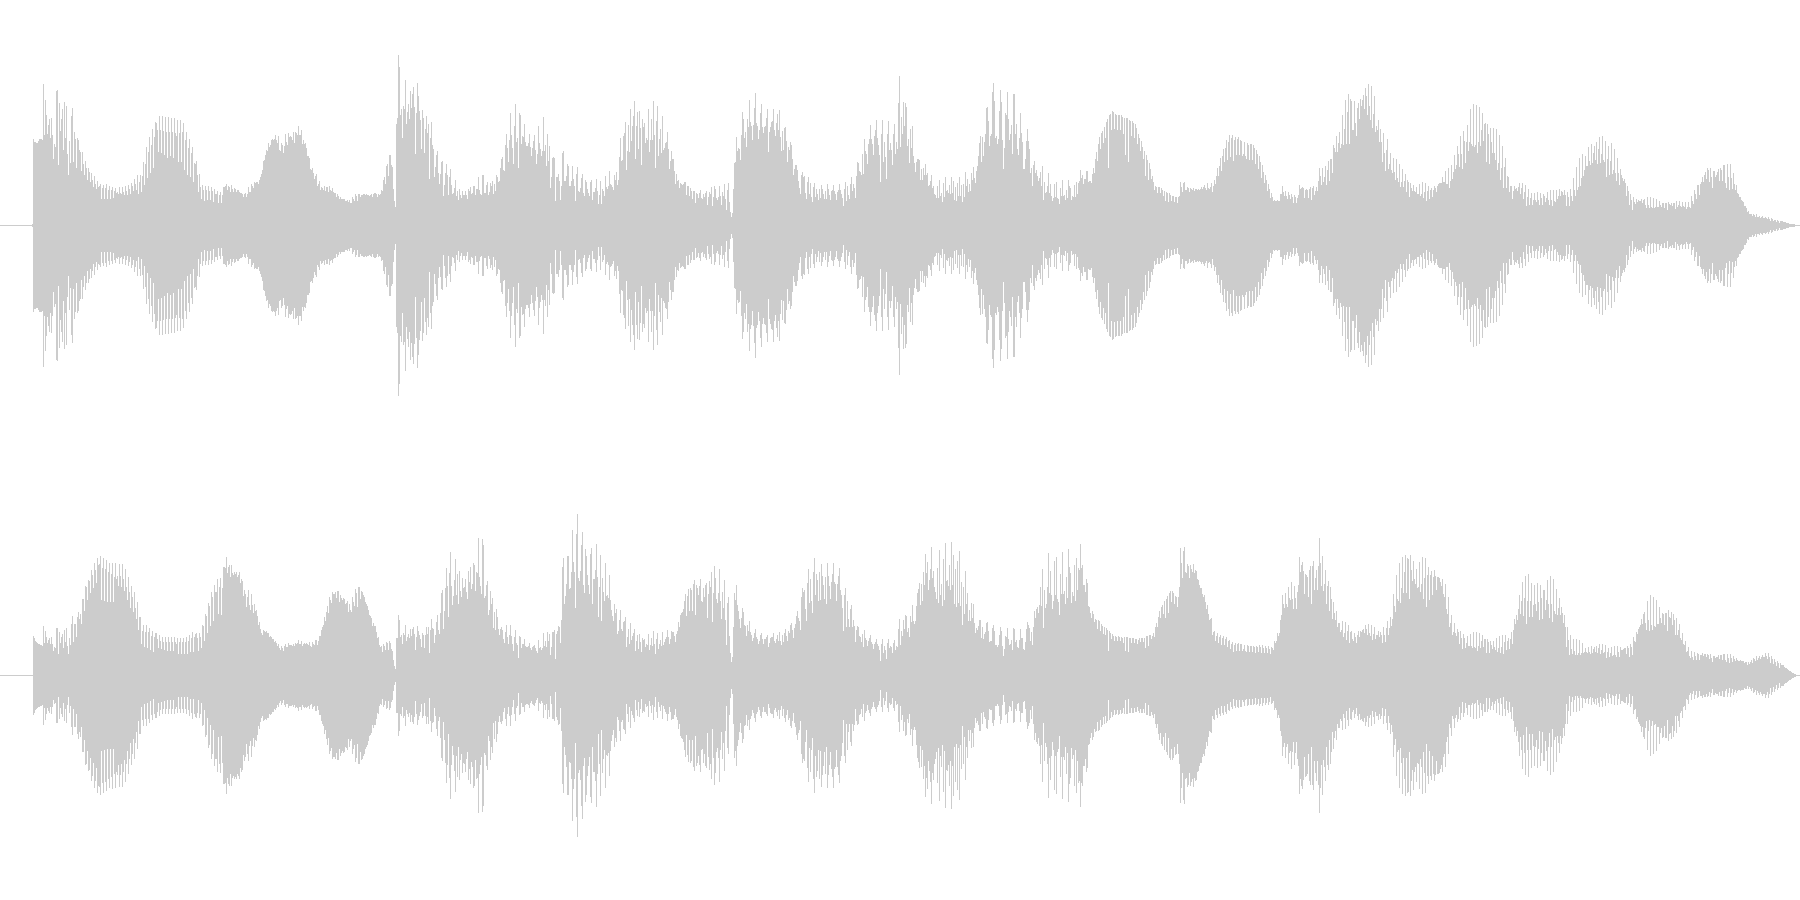 E.Piano soundの未再生の波形